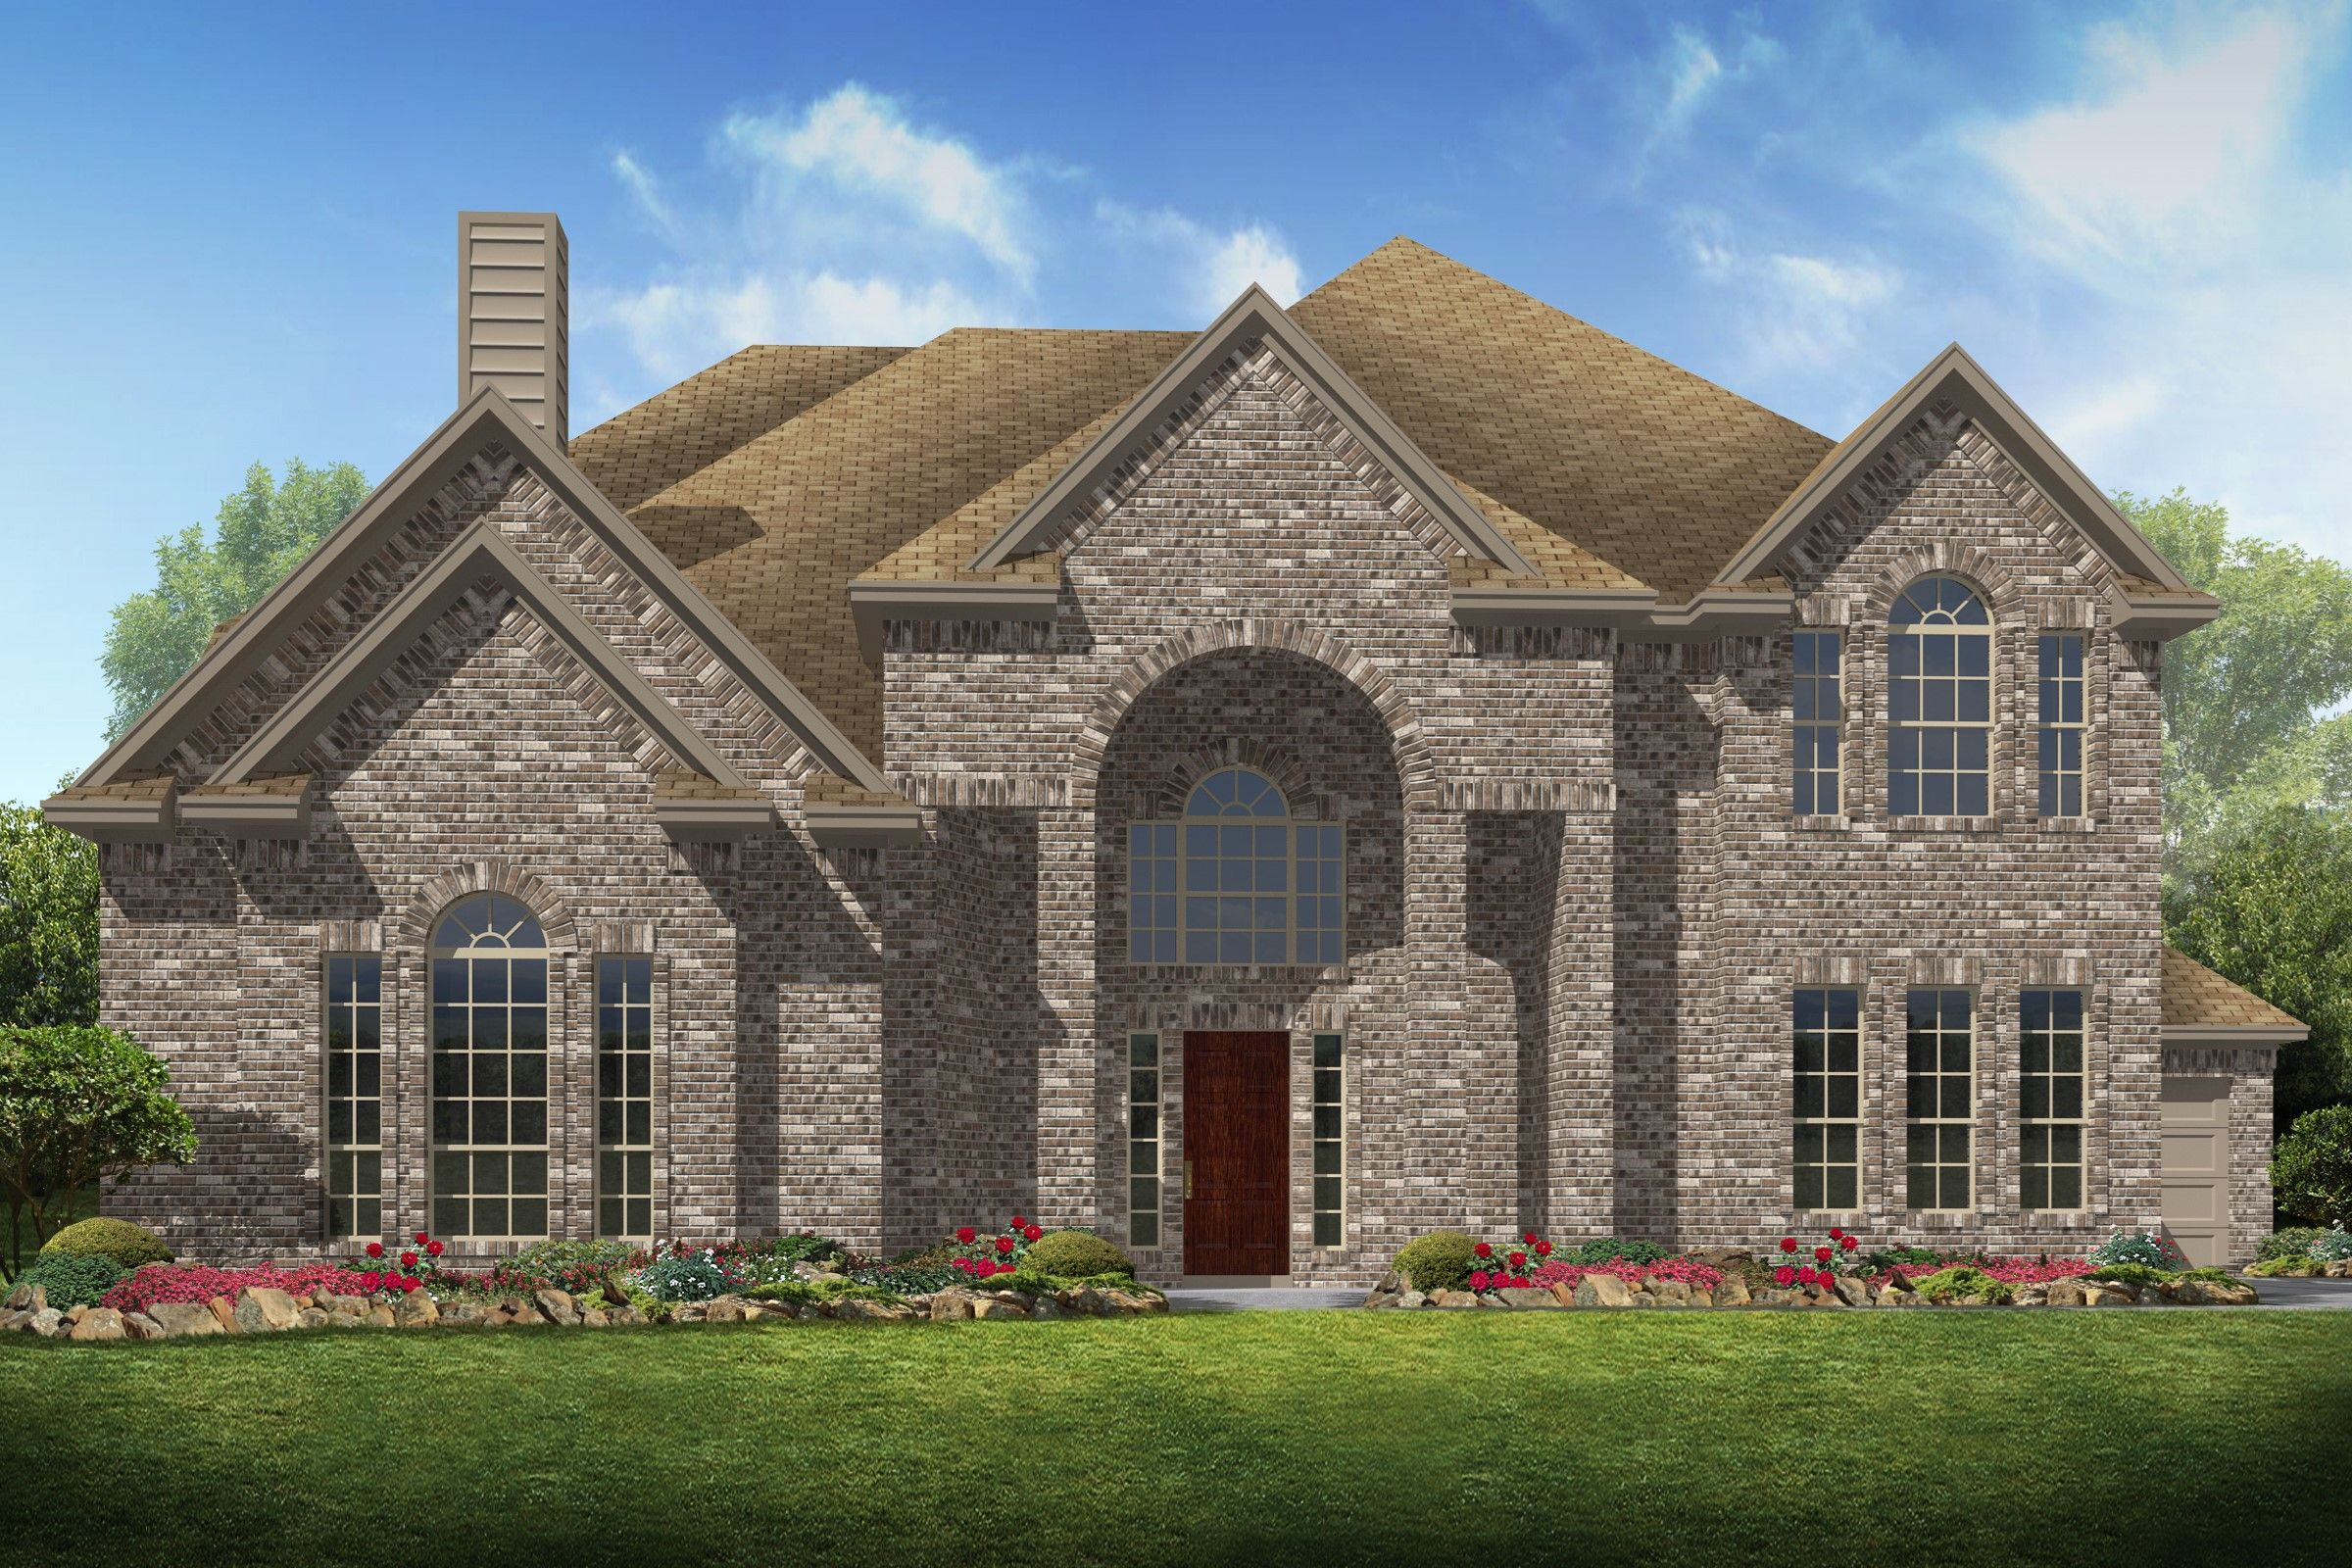 Single Family for Sale at Thunder Bay - Briarwood Mccollum Park Rd & Thunder Bay Beach City, Texas 77523 United States